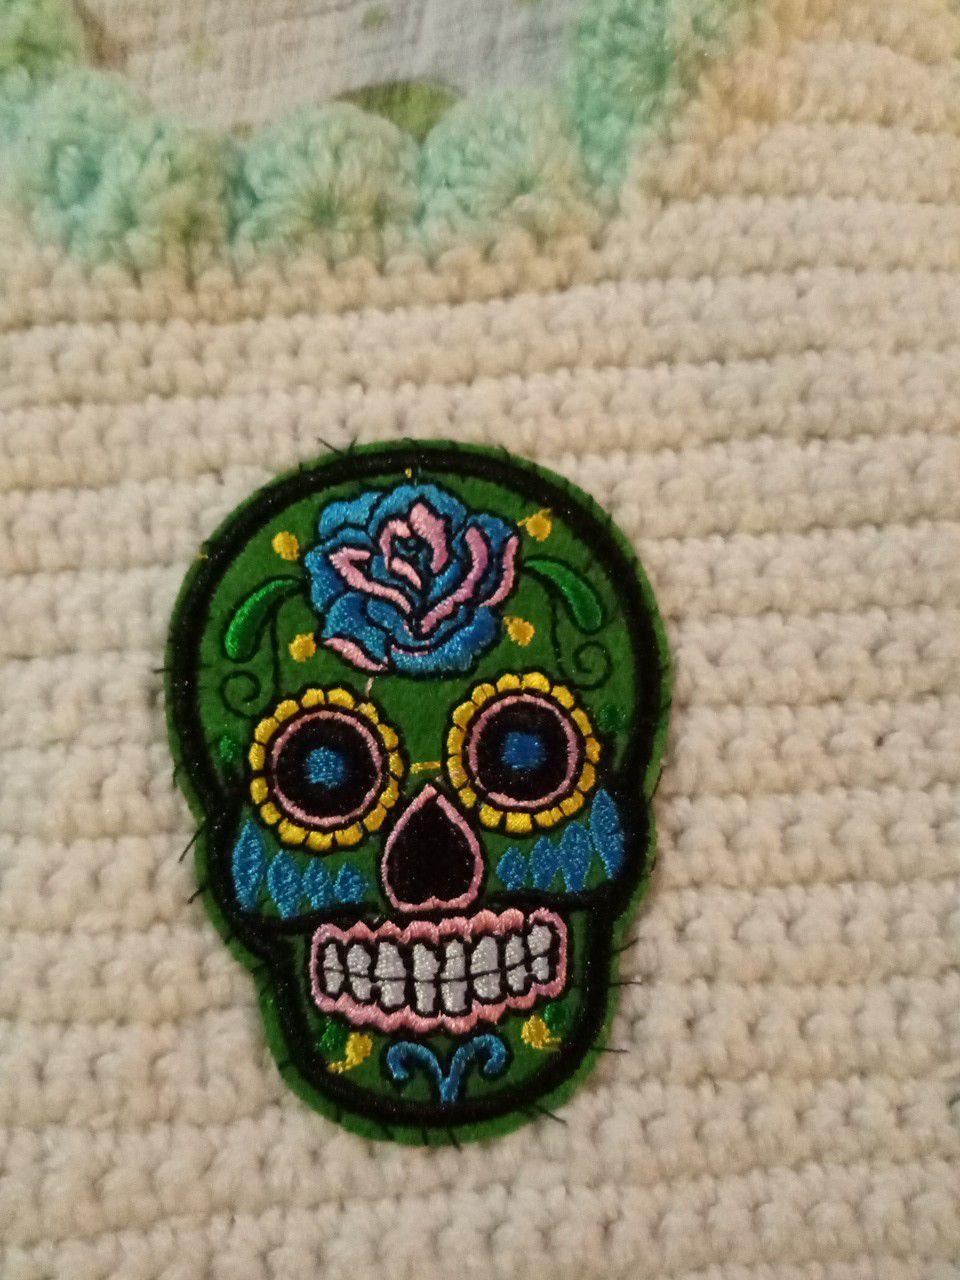 Hand-knitted sugar skull baby bib